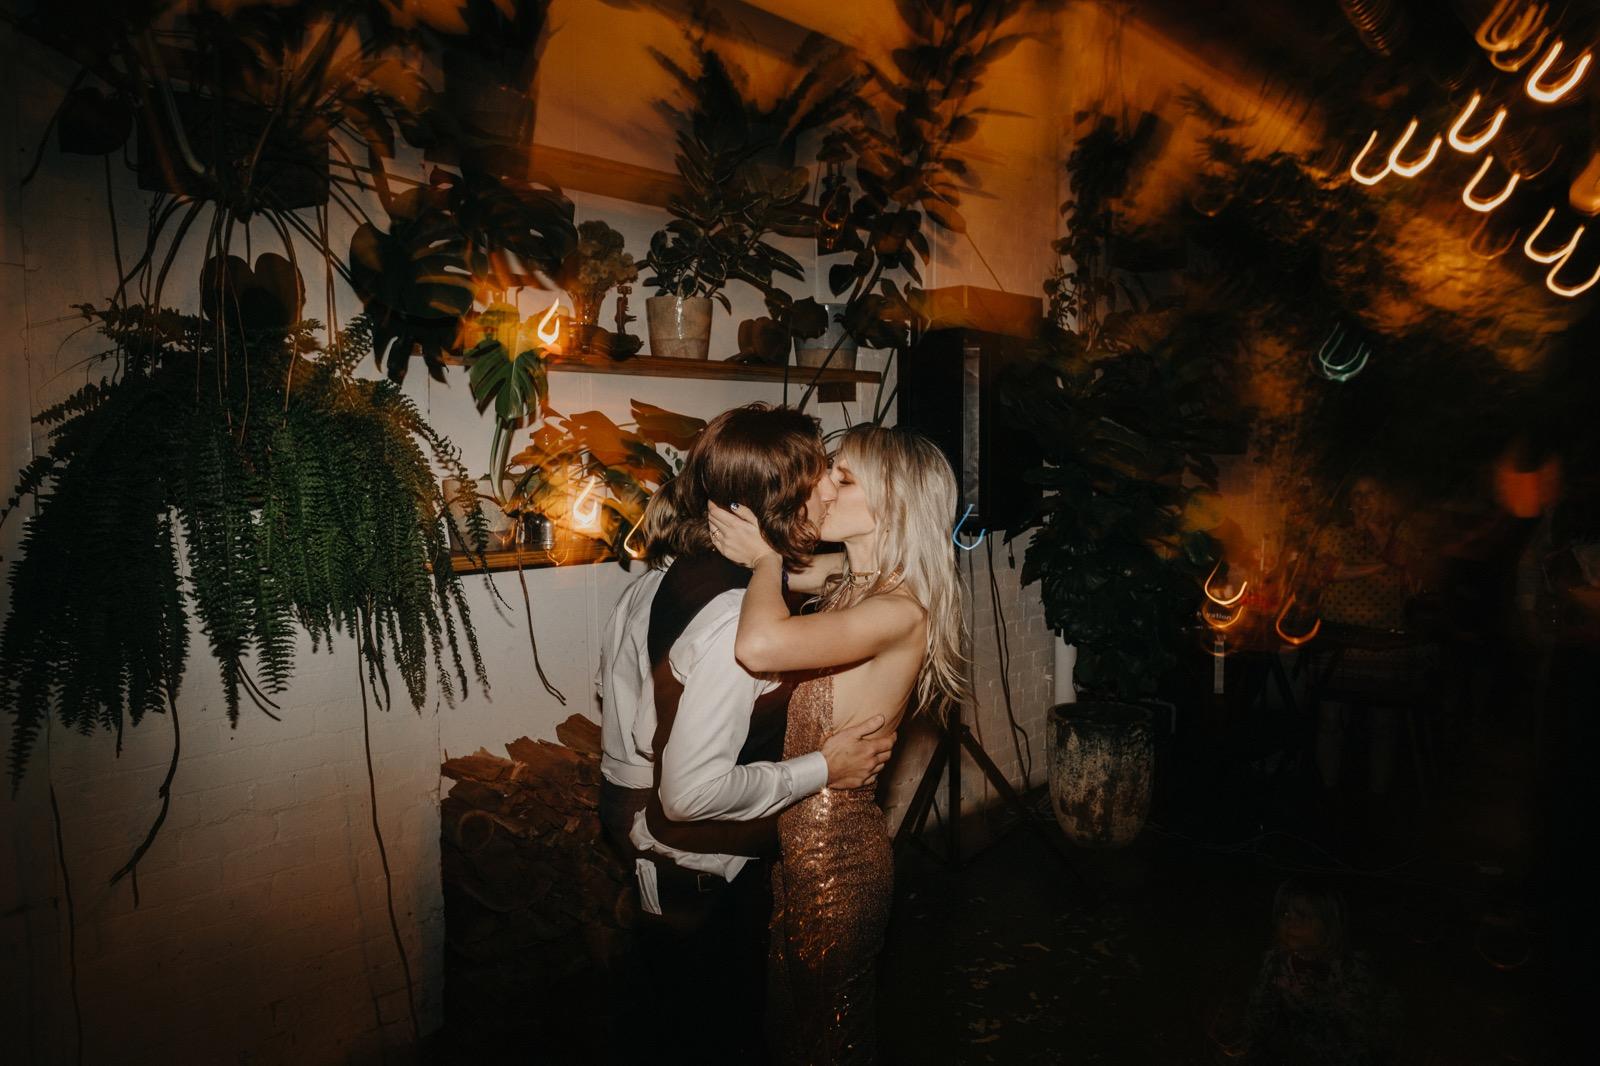 documentary-wedding-photography 00212